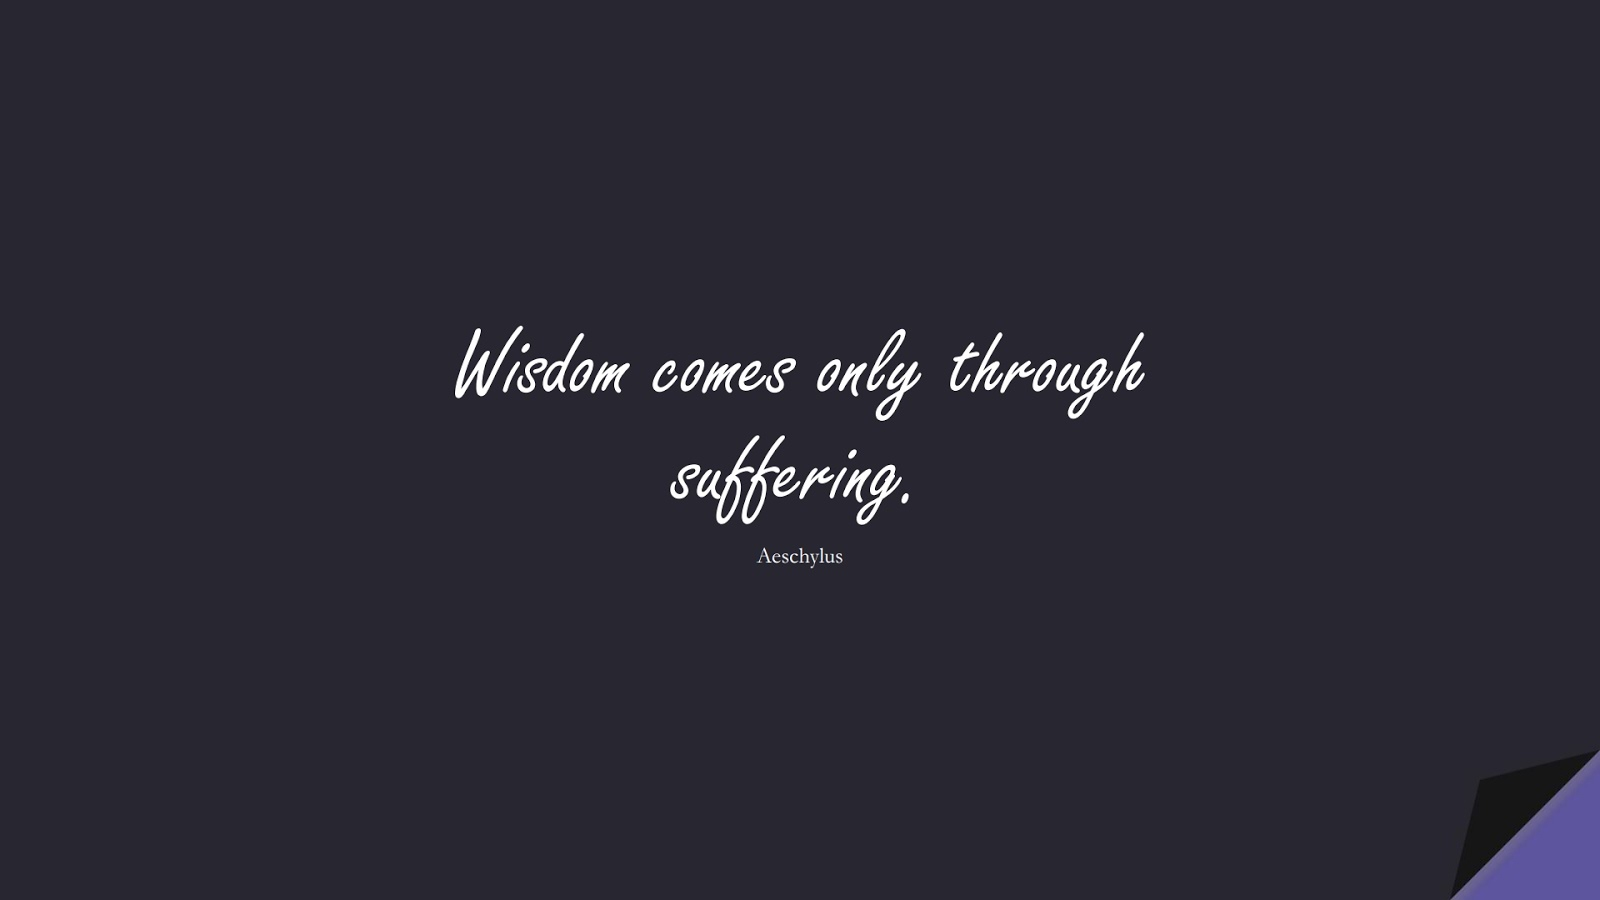 Wisdom comes only through suffering. (Aeschylus);  #WordsofWisdom